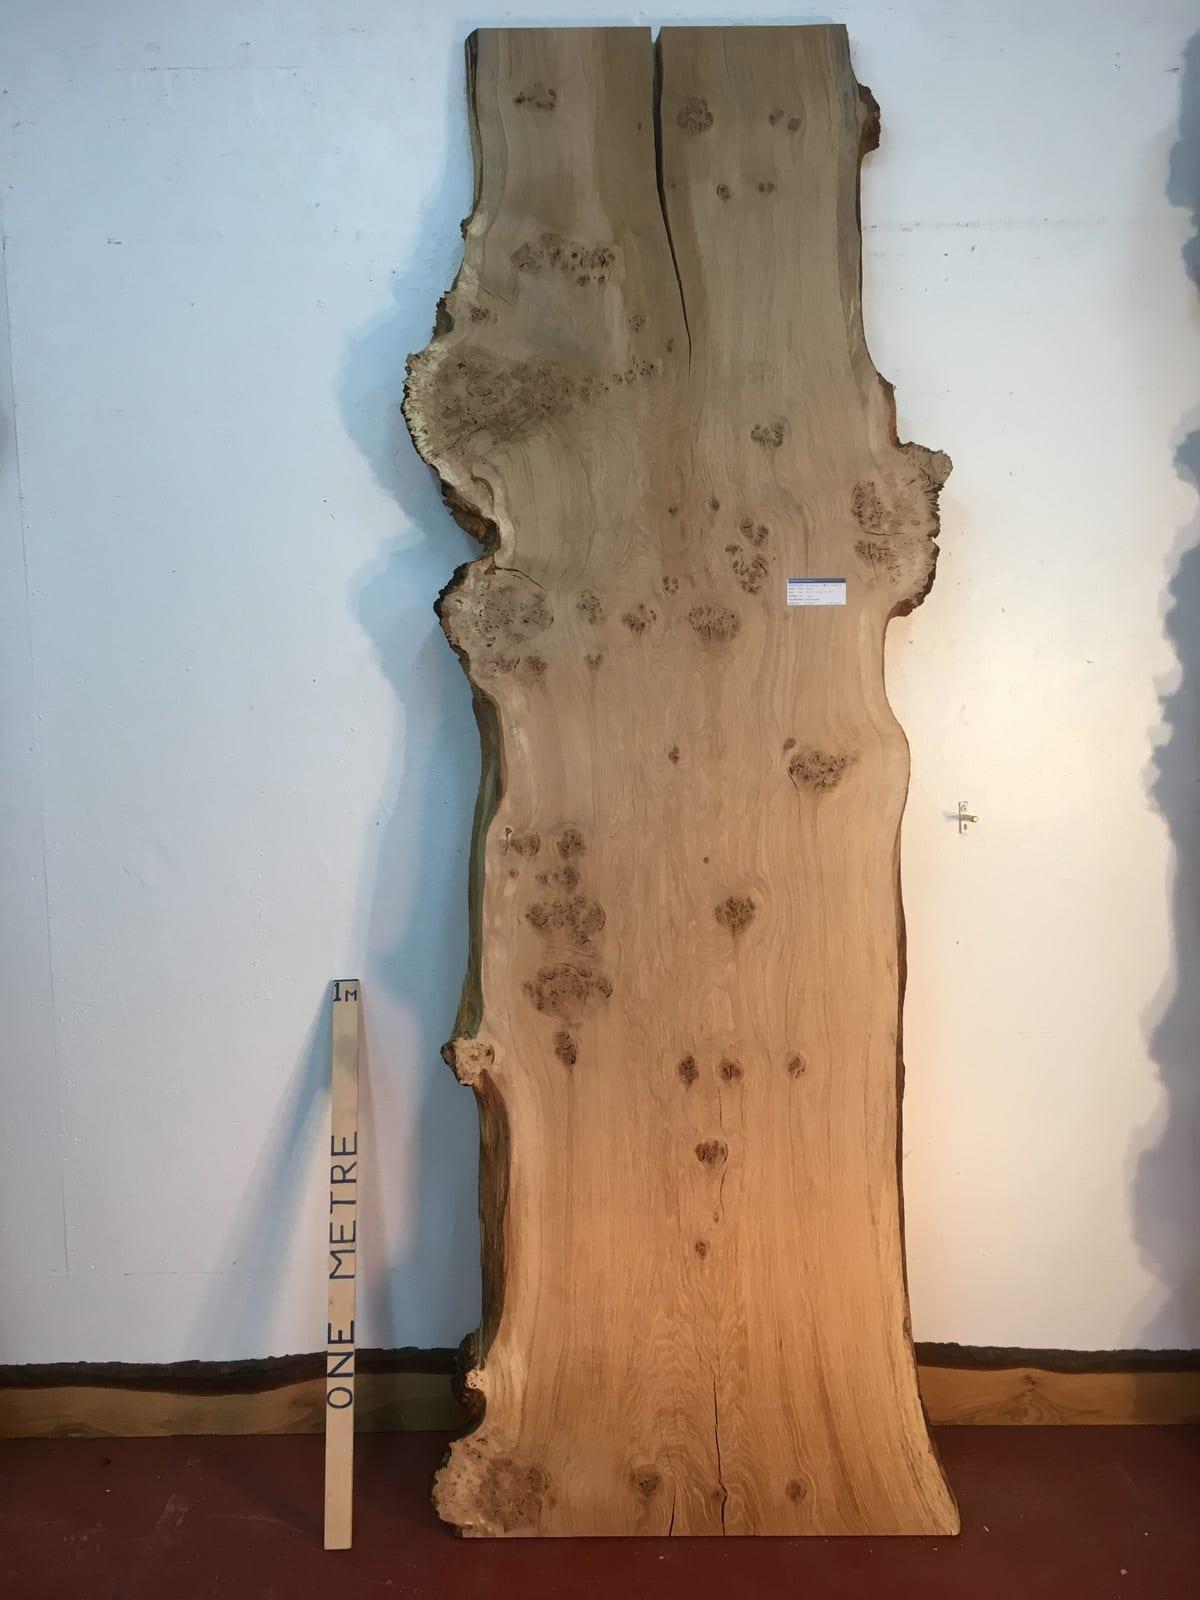 BURRY OAK 1089A-8 Natural Waney Live Edge Slab Board Thickness 4.5cm Kiln Dried Planed Seasoned Hardwood Wildwood Dining Coffee Table Top